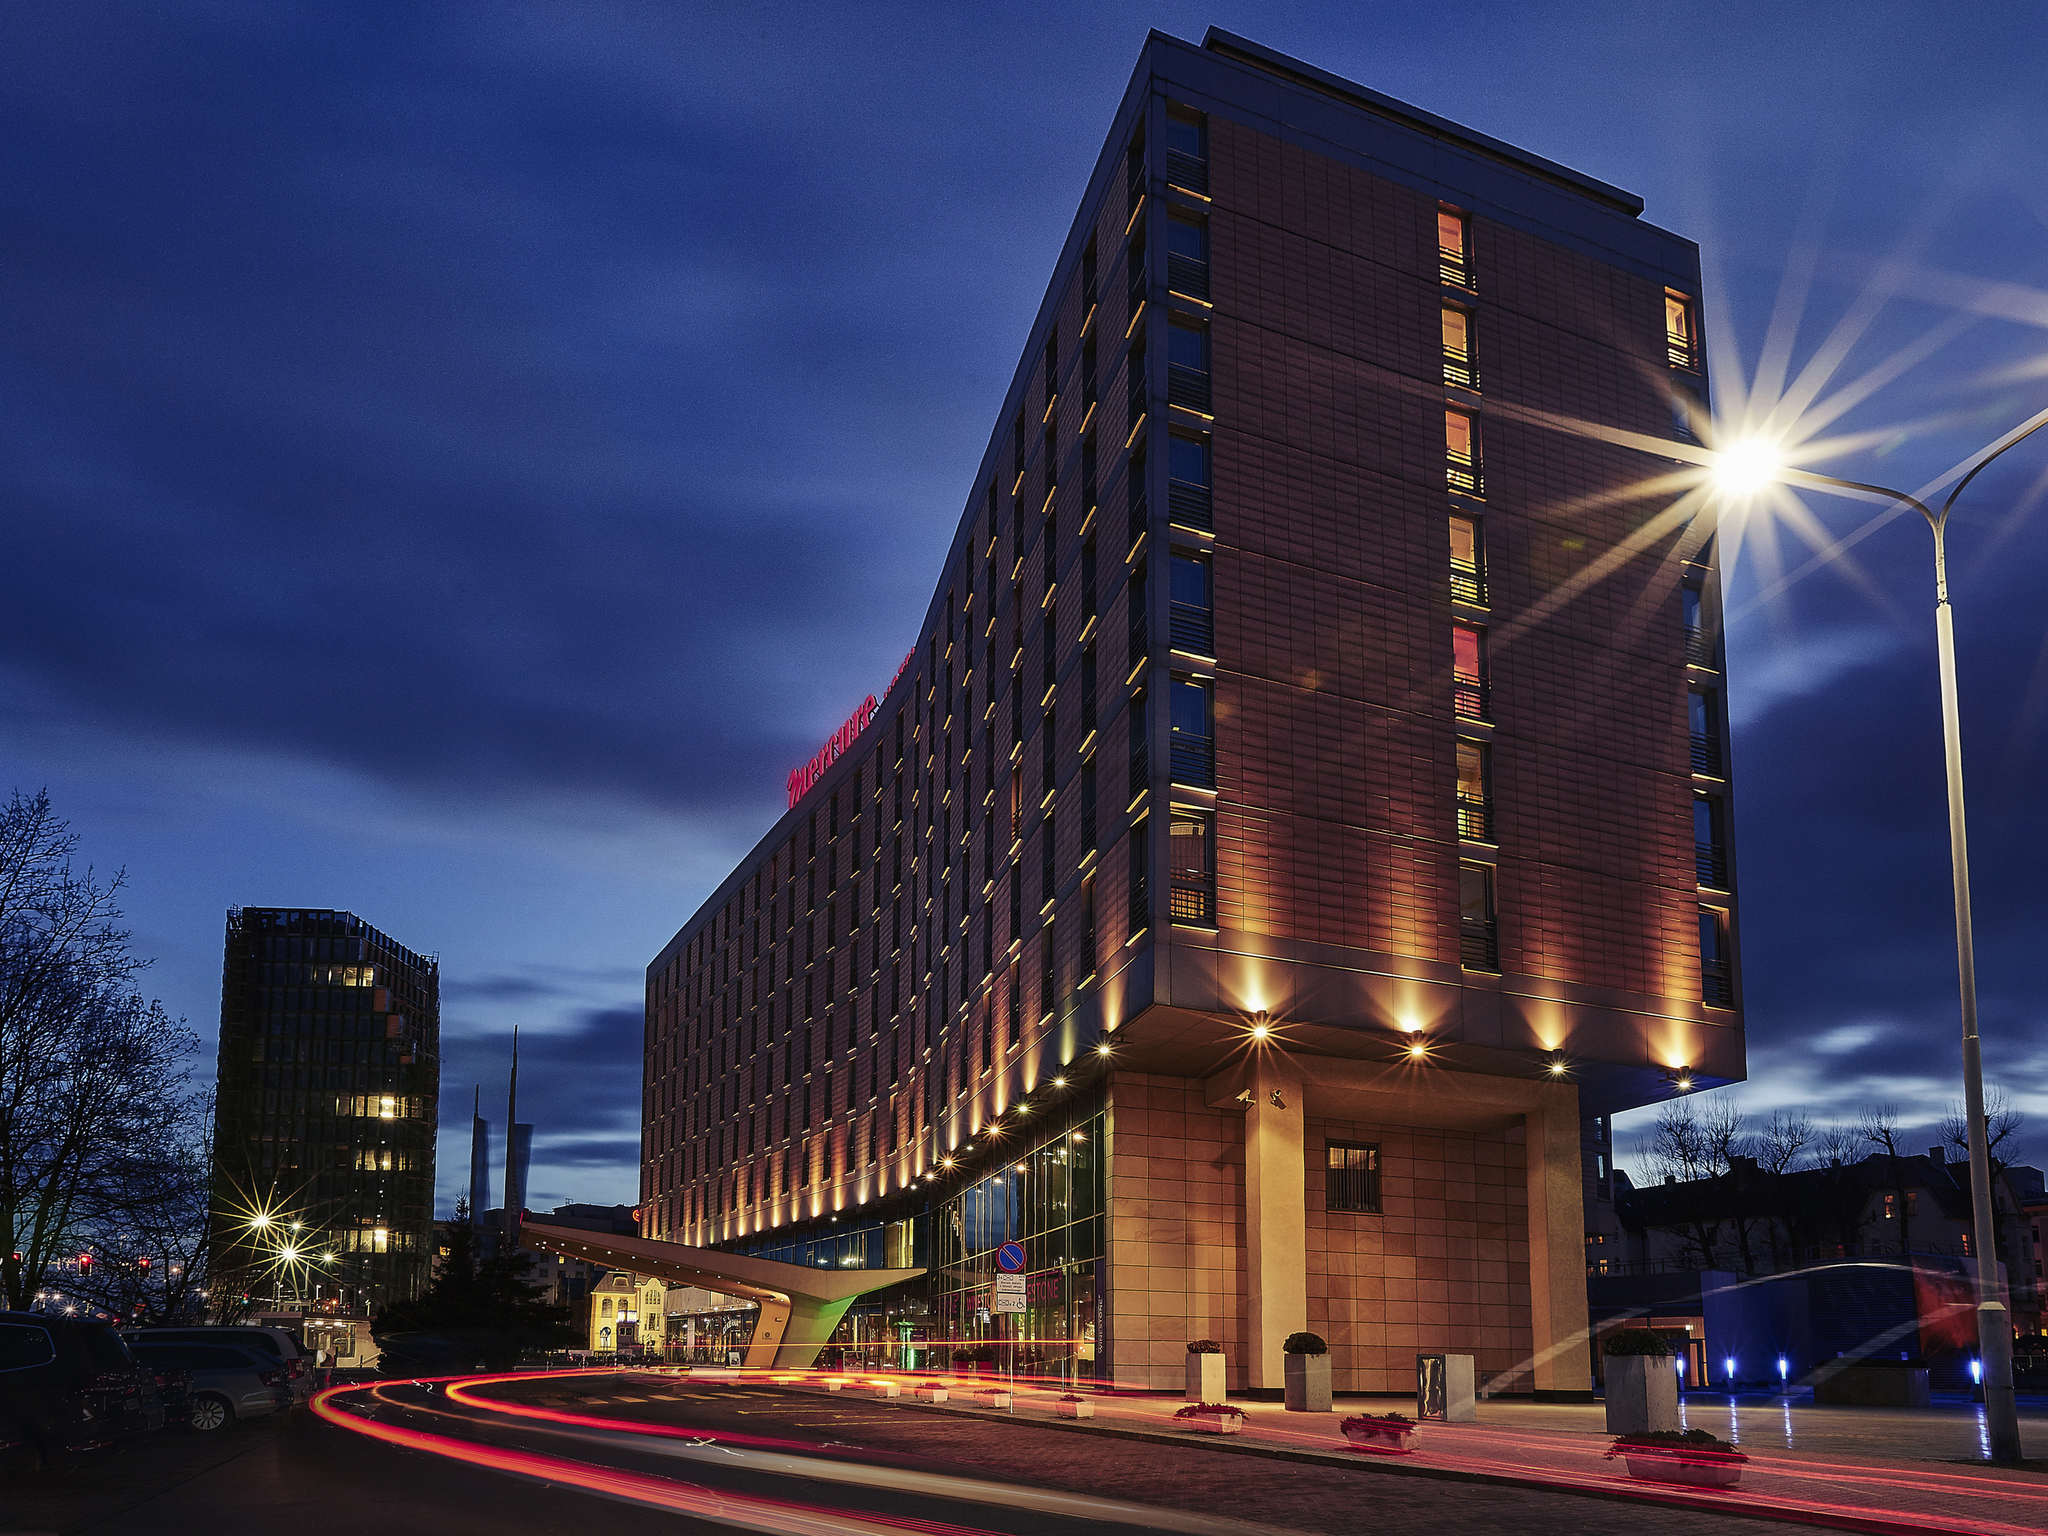 Hotel - Hotel Mercure Poznan Centrum